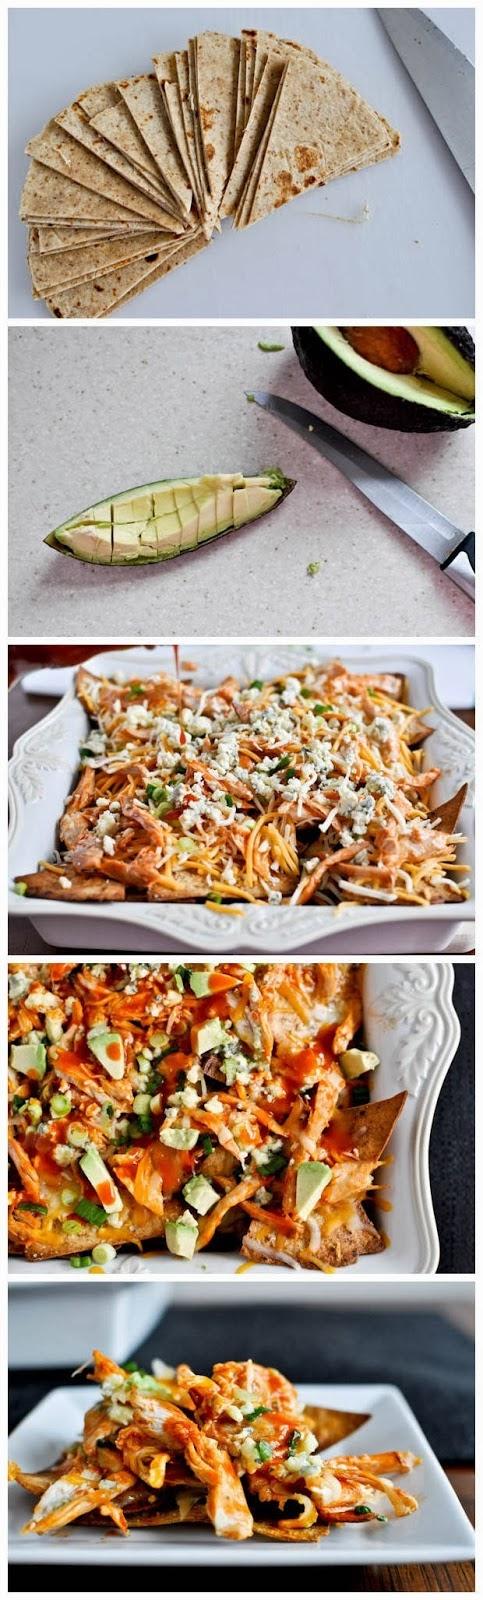 Baked-Layered-Buffalo-Chicken-Nachos-Recipe